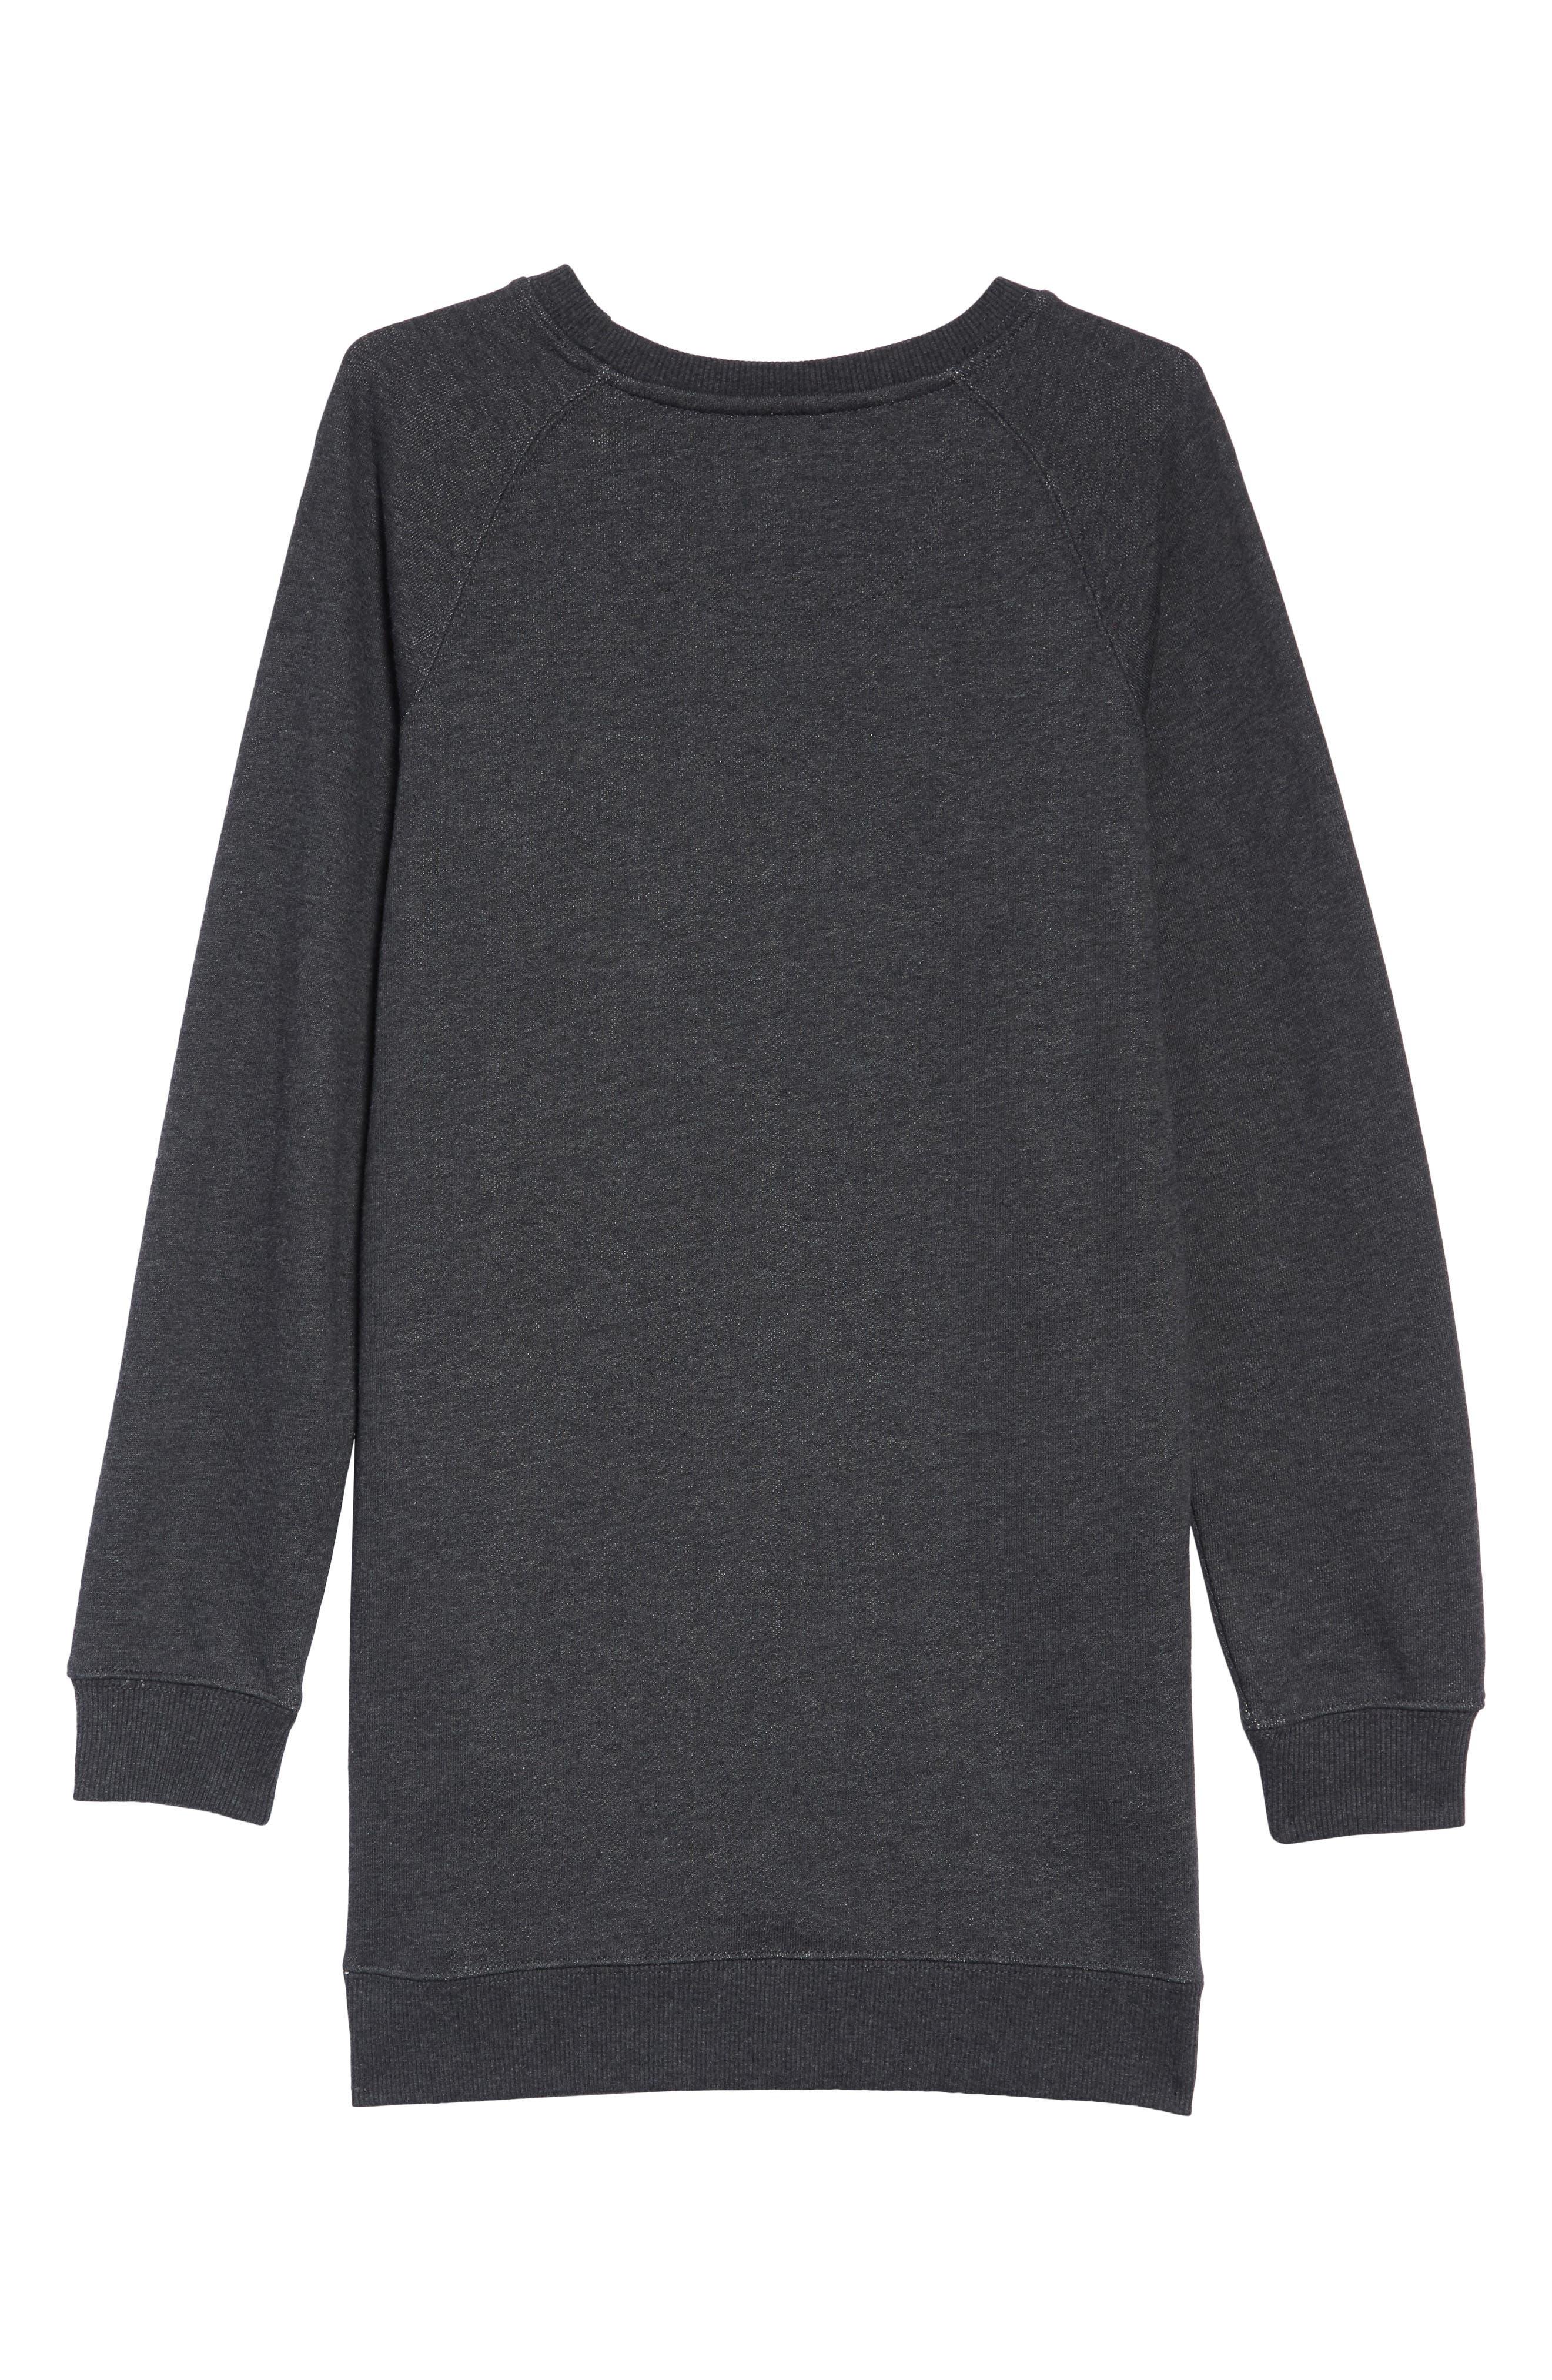 Sweatshirt Dress,                             Alternate thumbnail 2, color,                             BLACK HEATHER